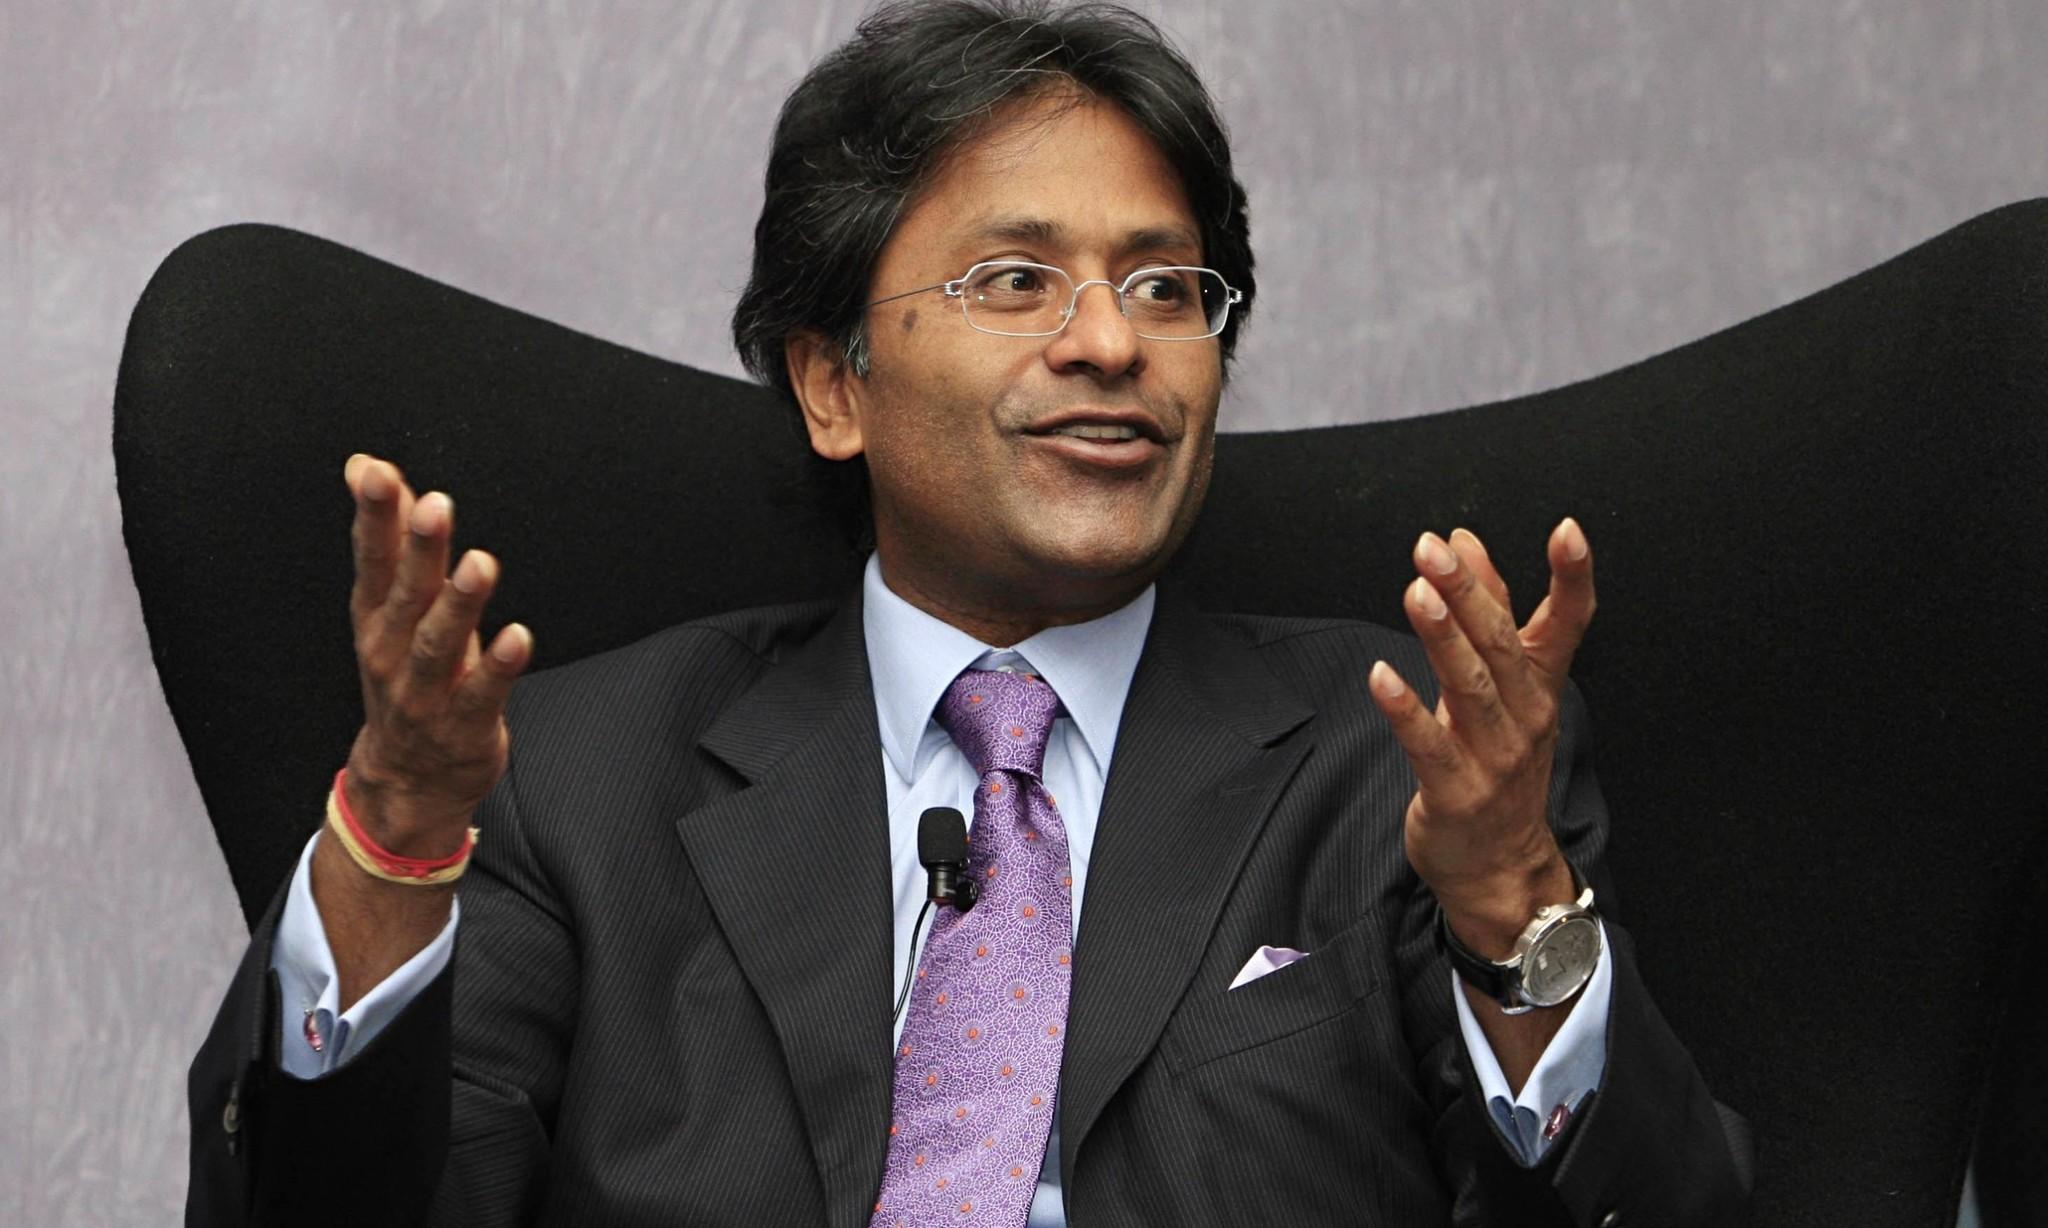 Lalit Modi warns ICC of multibillion-pound rebel threat to its monopoly